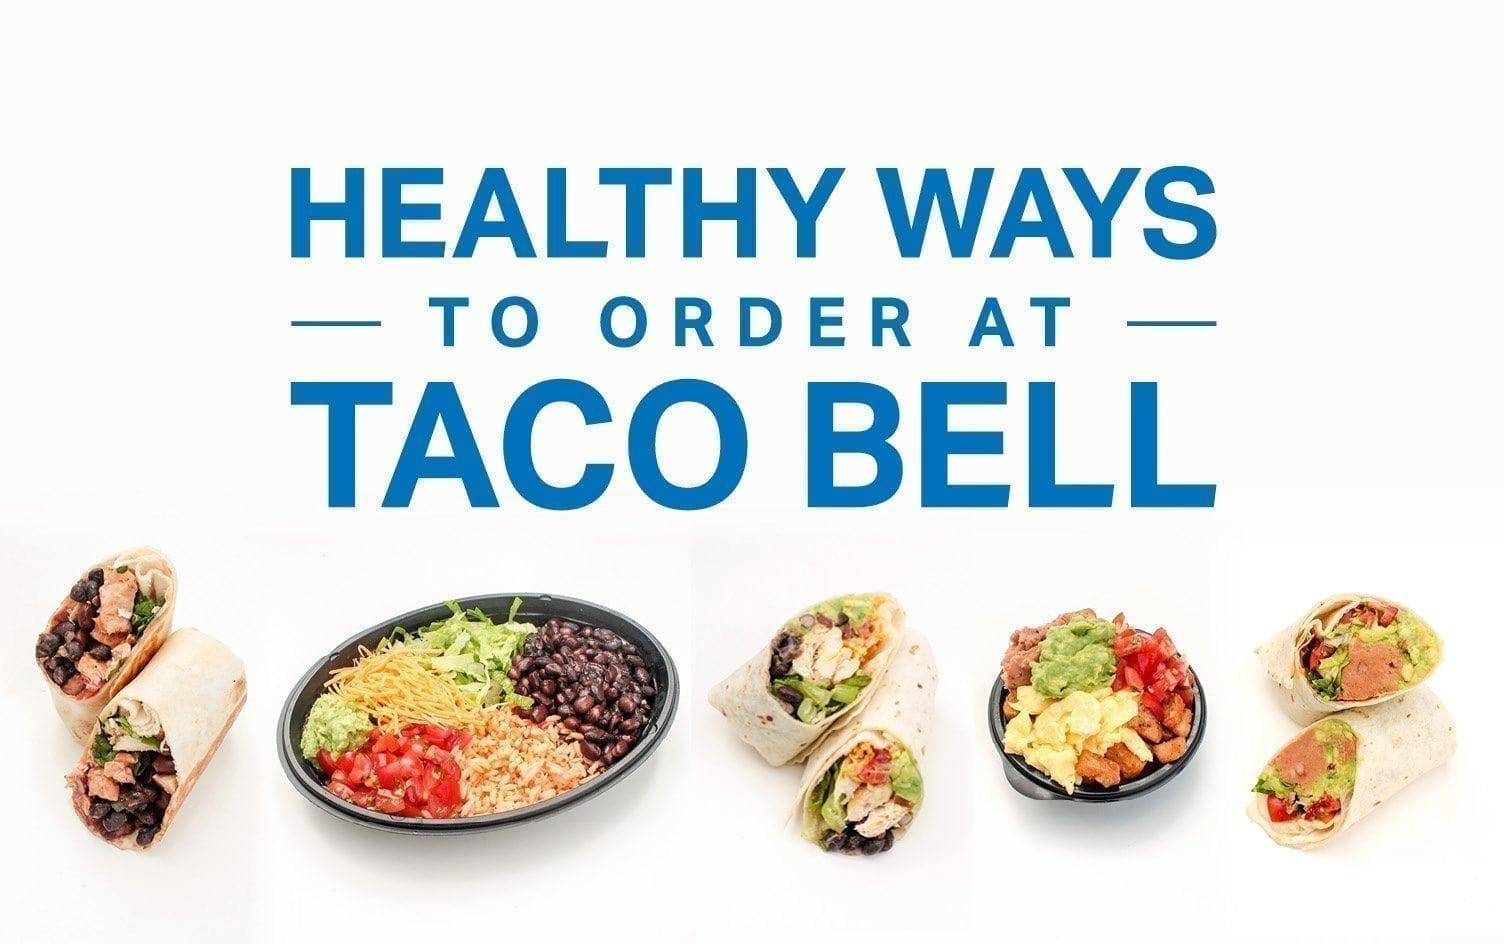 Healthy Ways to Order at Taco Bell | MyFitnessPal